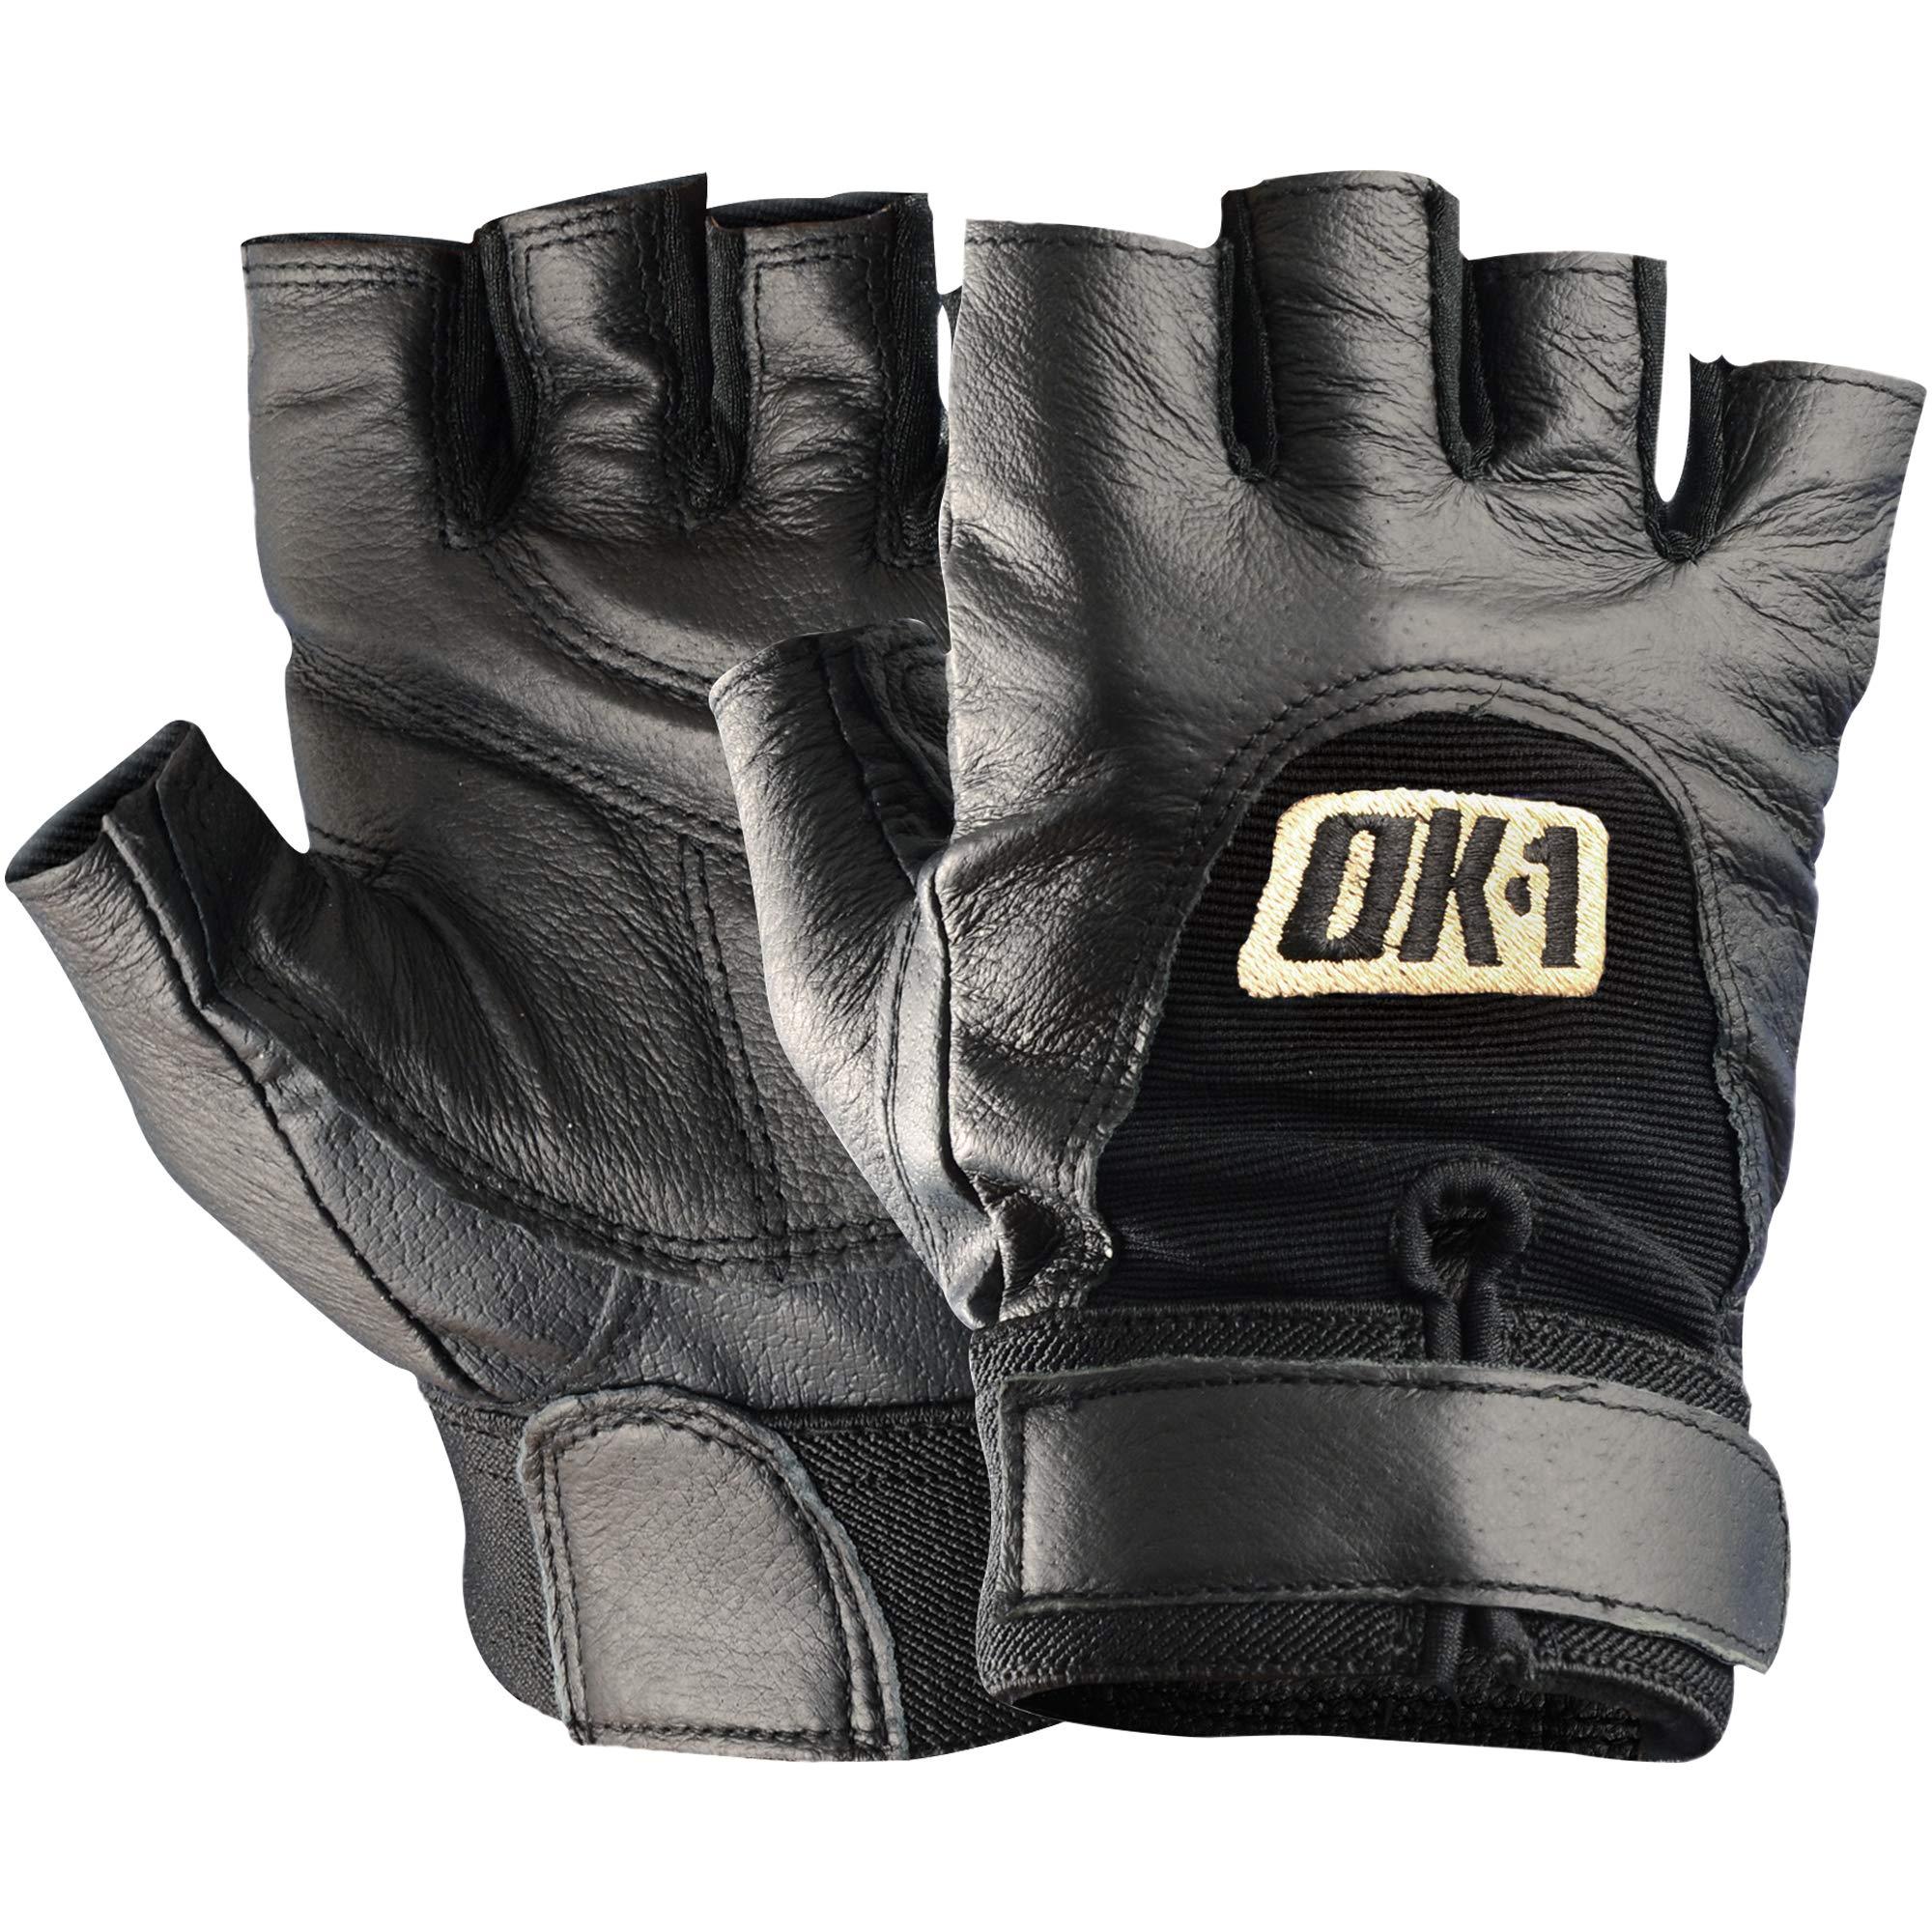 Boxes Fast BFGLV1027M Half-Finger Impact Gloves, Medium, Black (Pack of 2 Pairs)